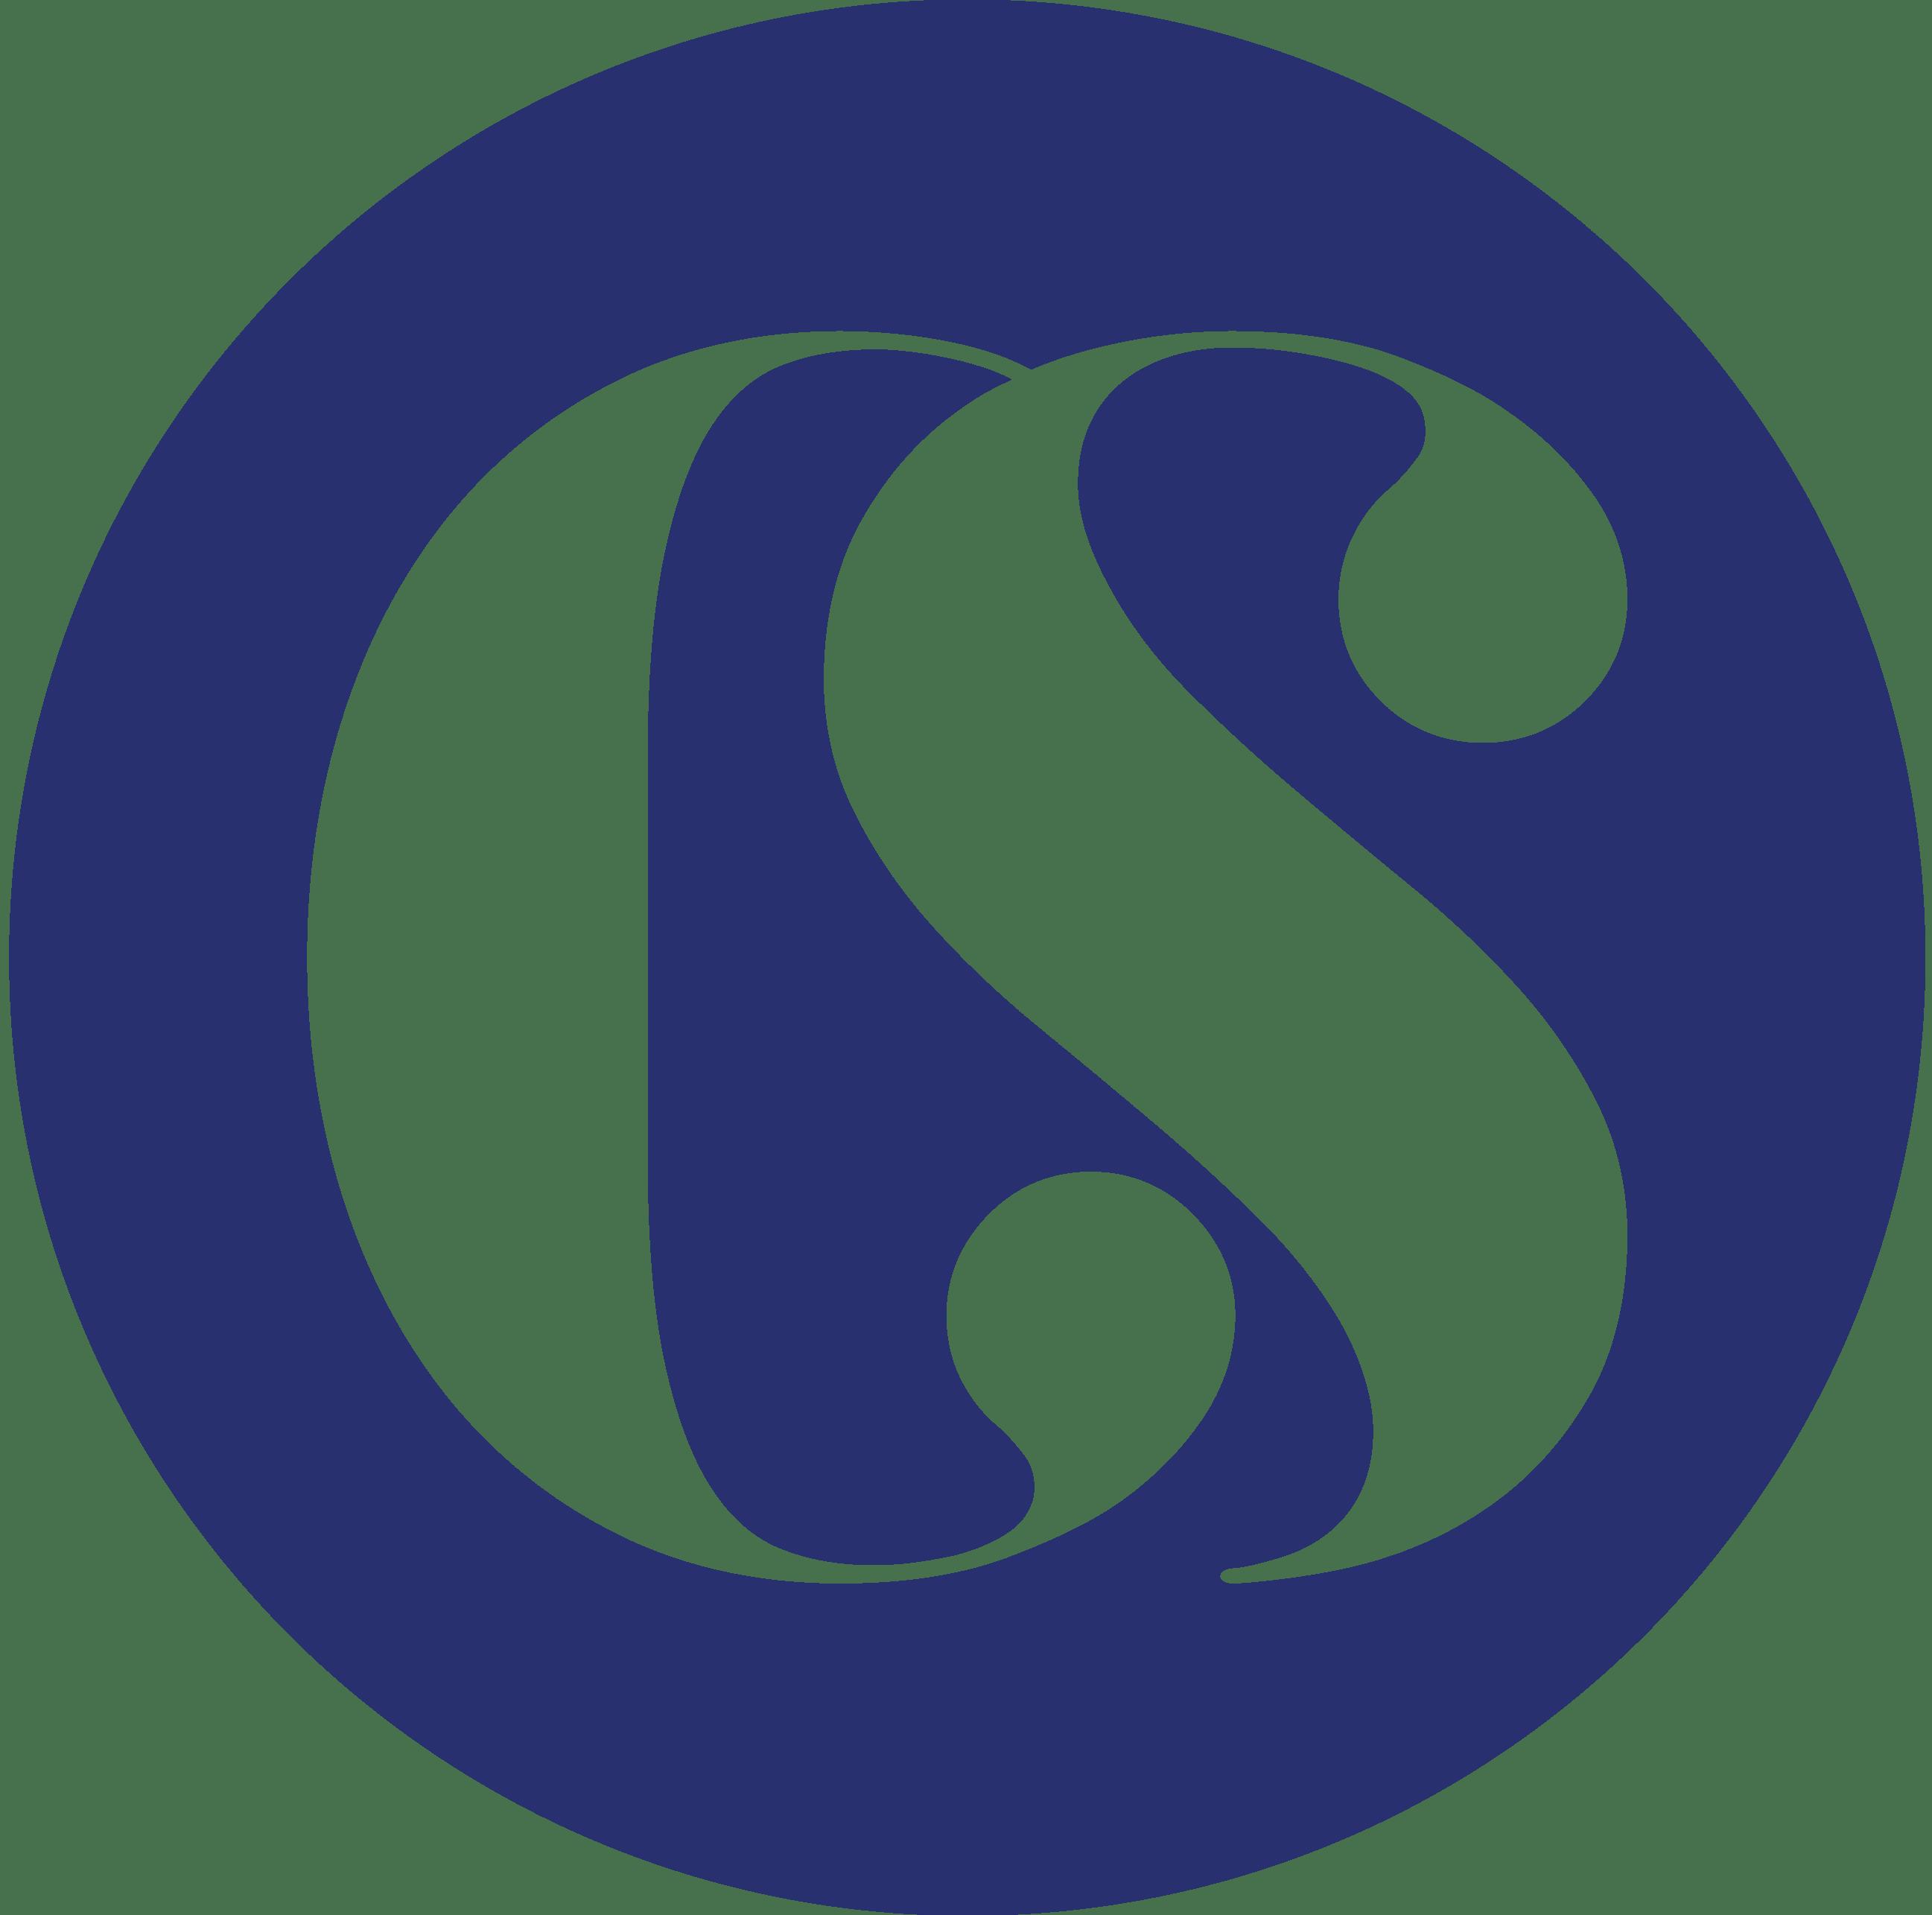 logo-CosmopolitanStudio-bleumarine